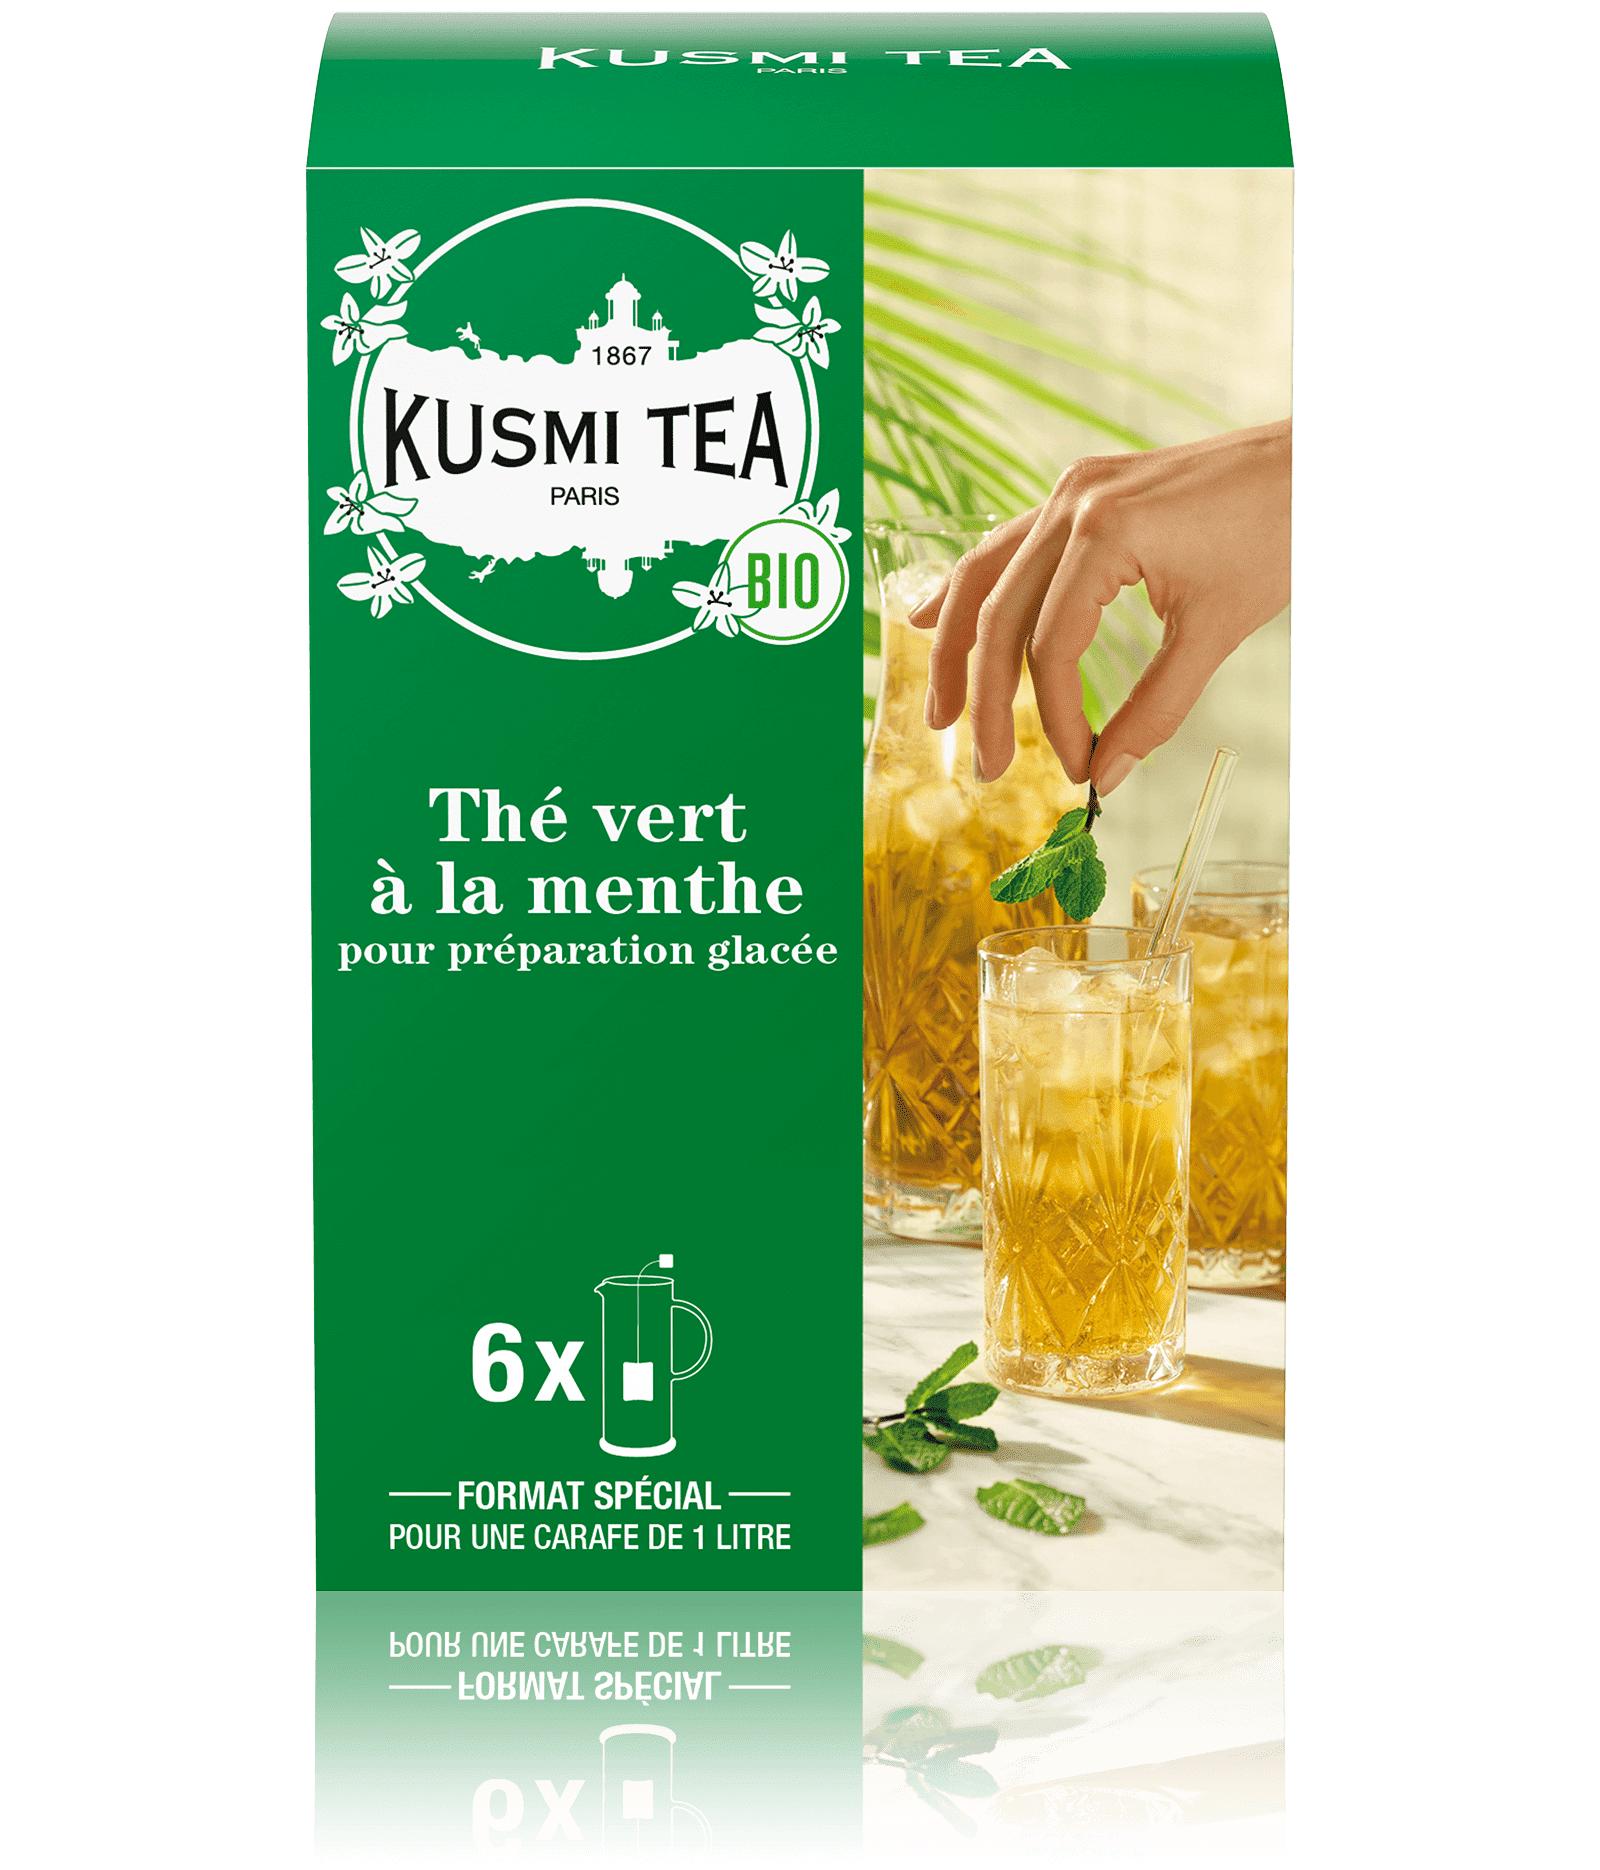 KUSMI TEA Thé vert à la menthe bio - Thé vert à la menthe - Sachets de thé - Kusmi Tea